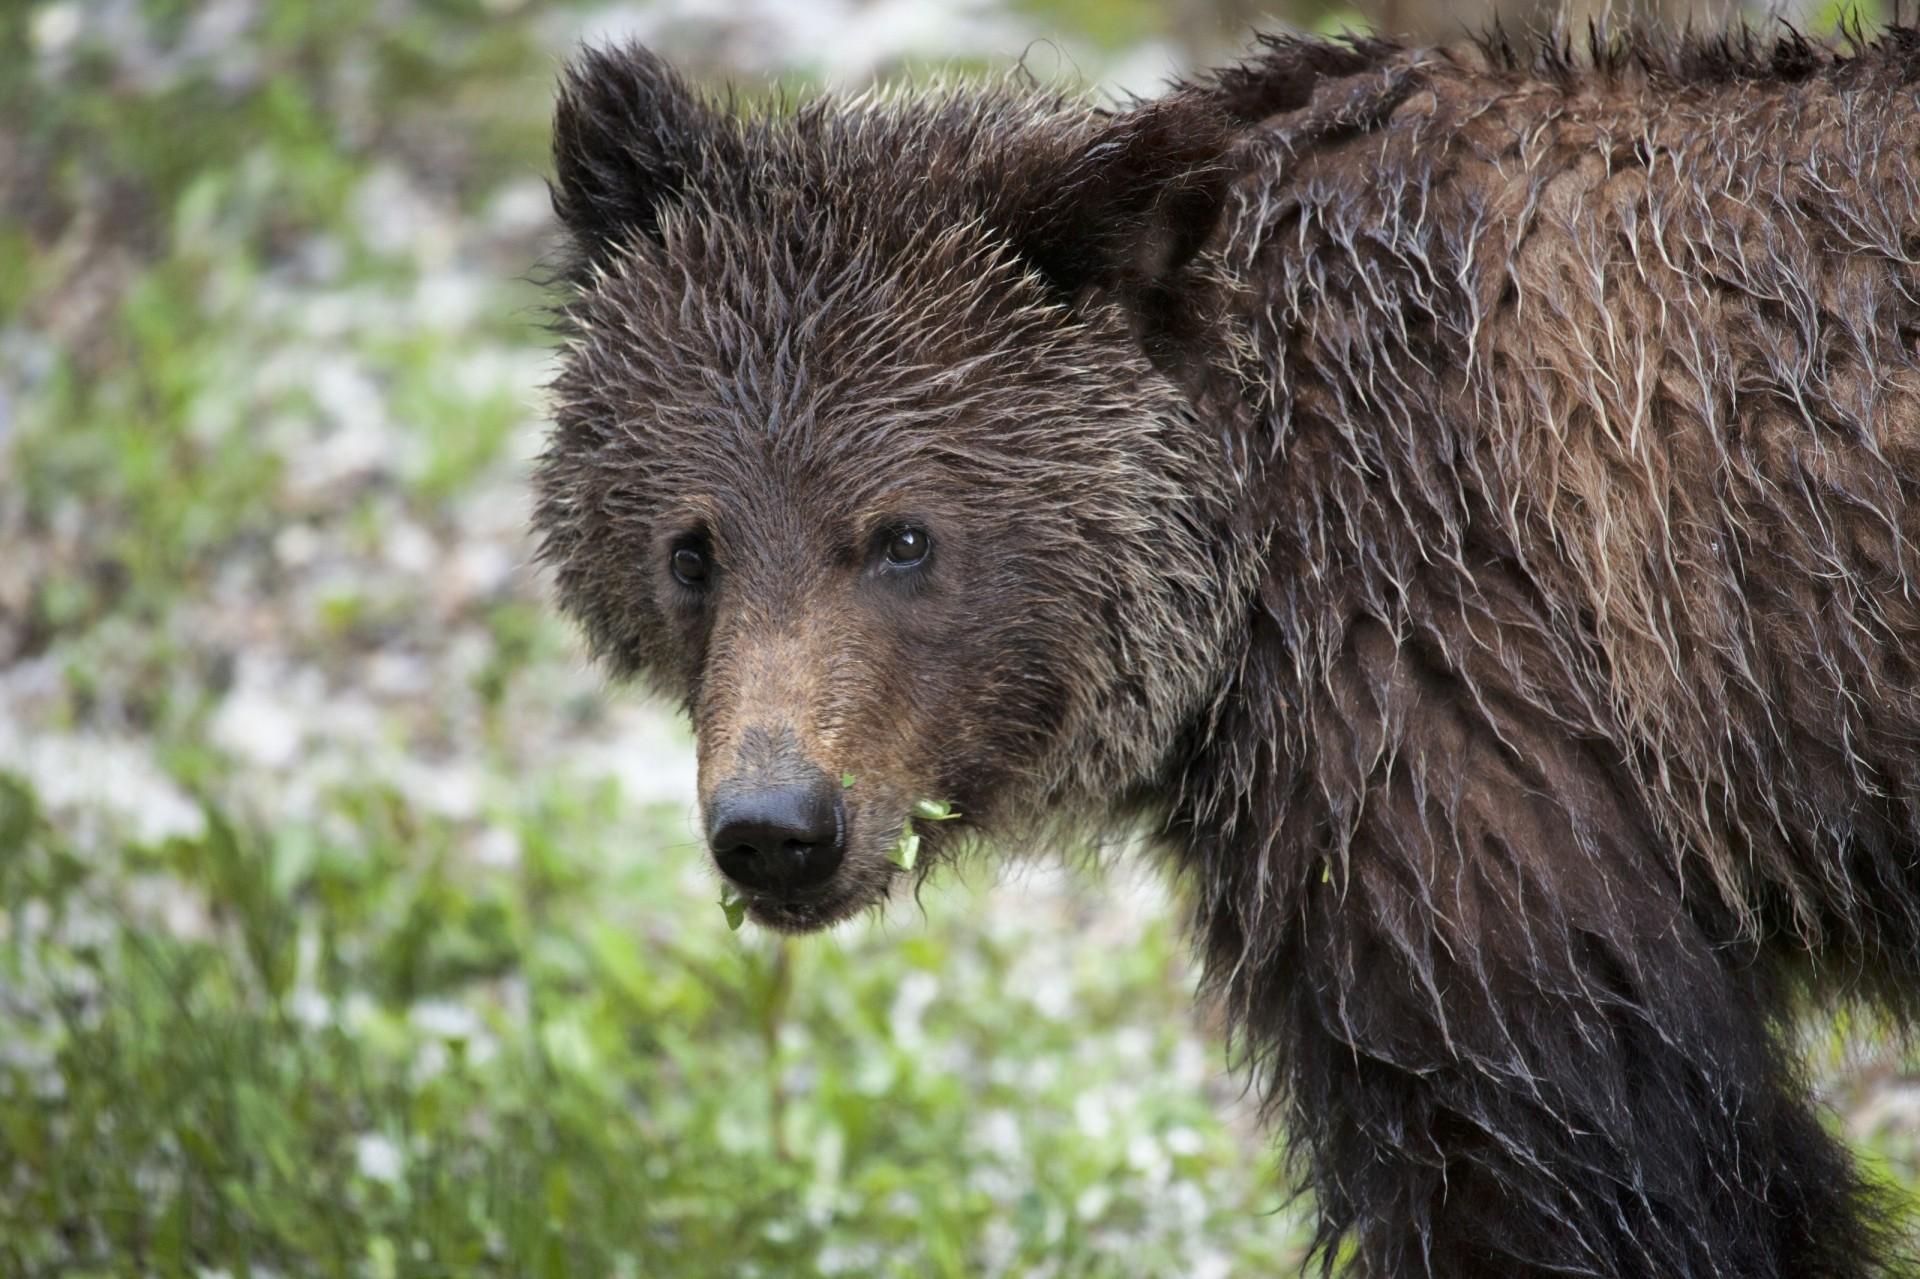 вместо картинки мокрый медведь исполнения